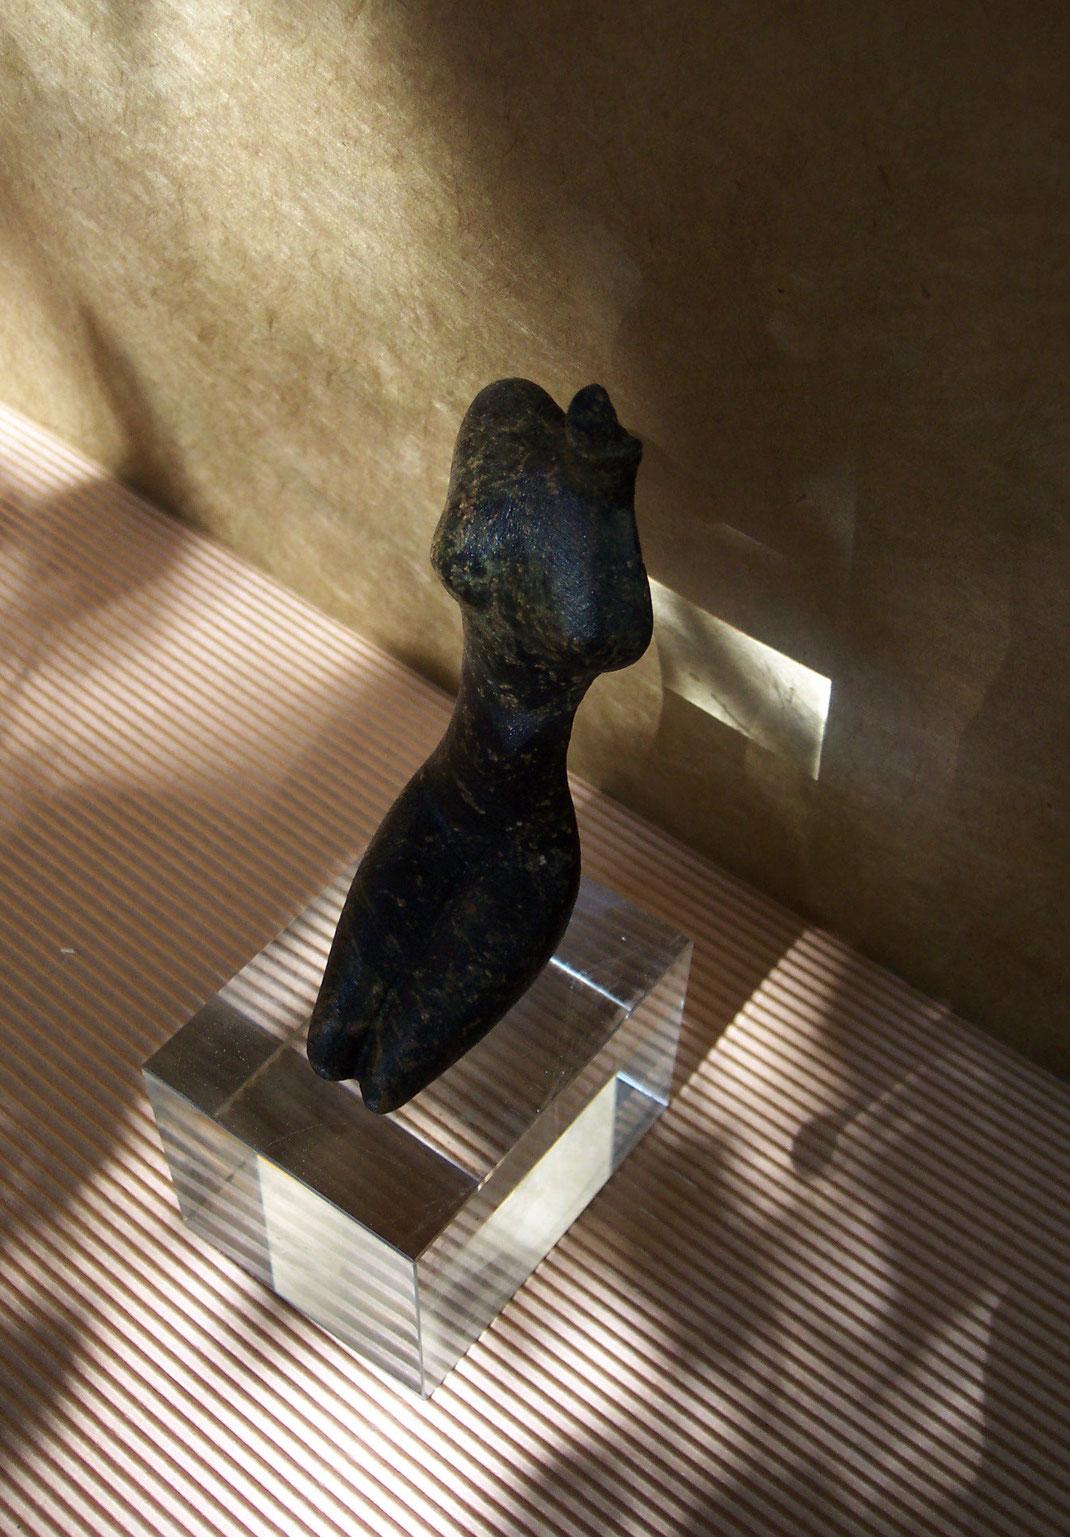 Heidrun Feistner: Erinnerung an Ägypten / Stein / Foto HF